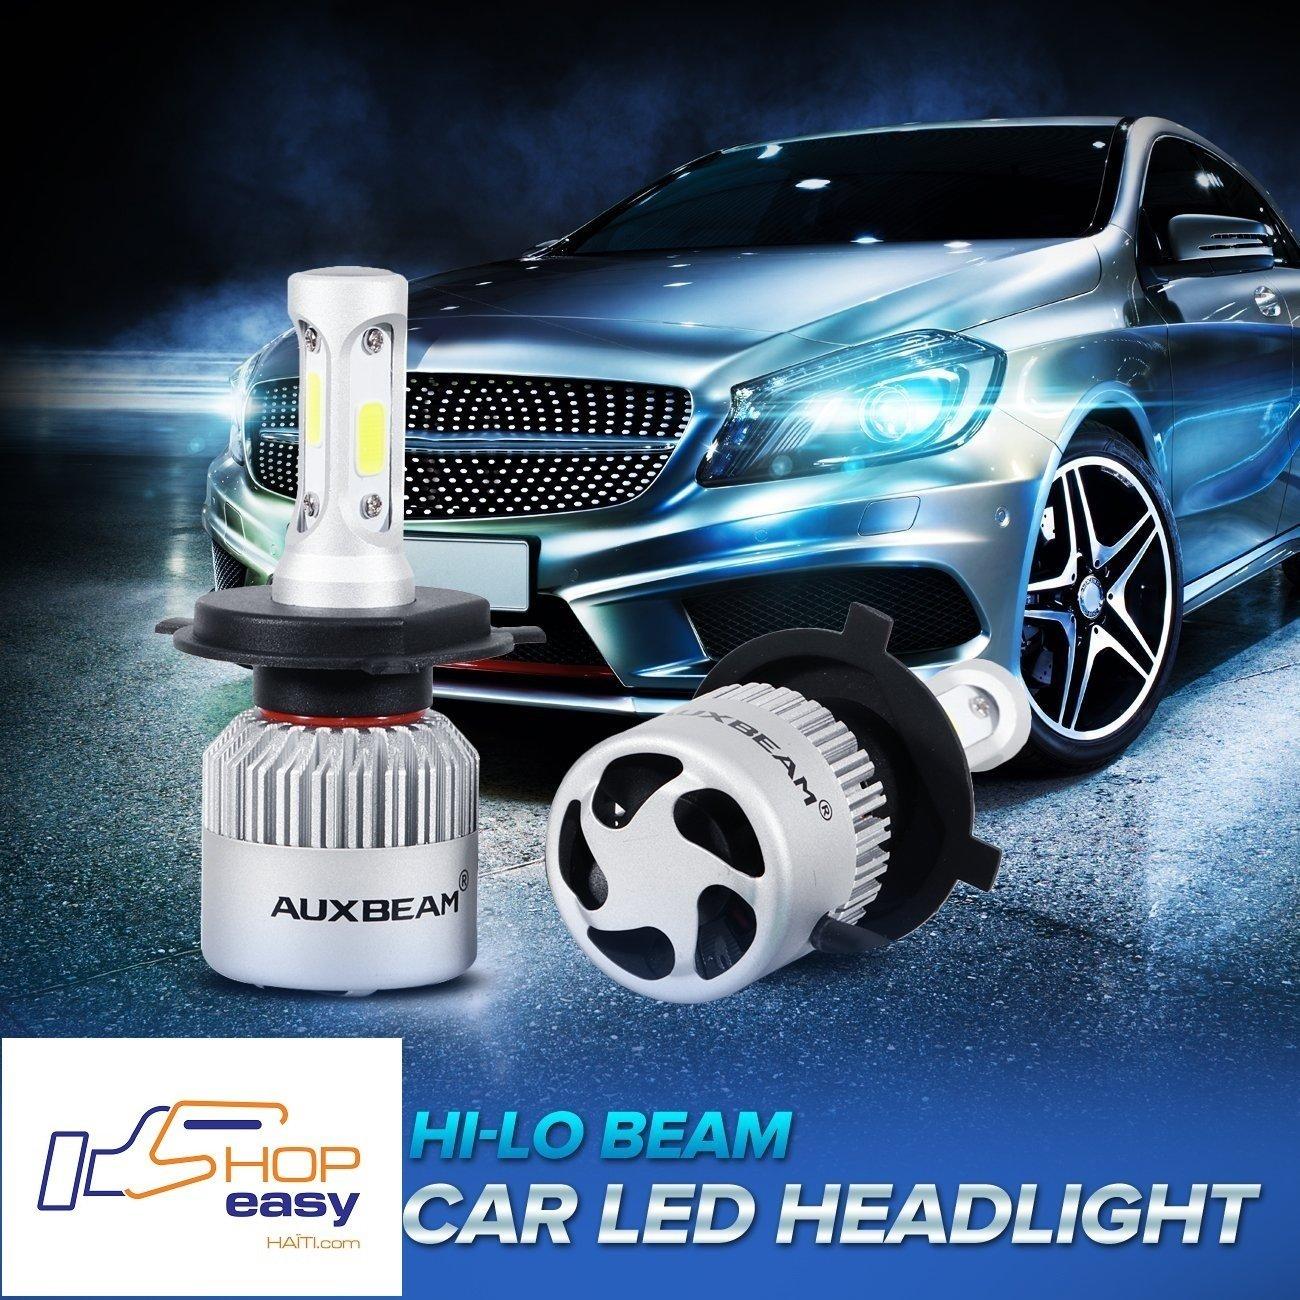 H4 C6 HeadLight Buld Lumiere Phare Vehicule (PAIRE) Ampoule UNIVERSELLE 36W